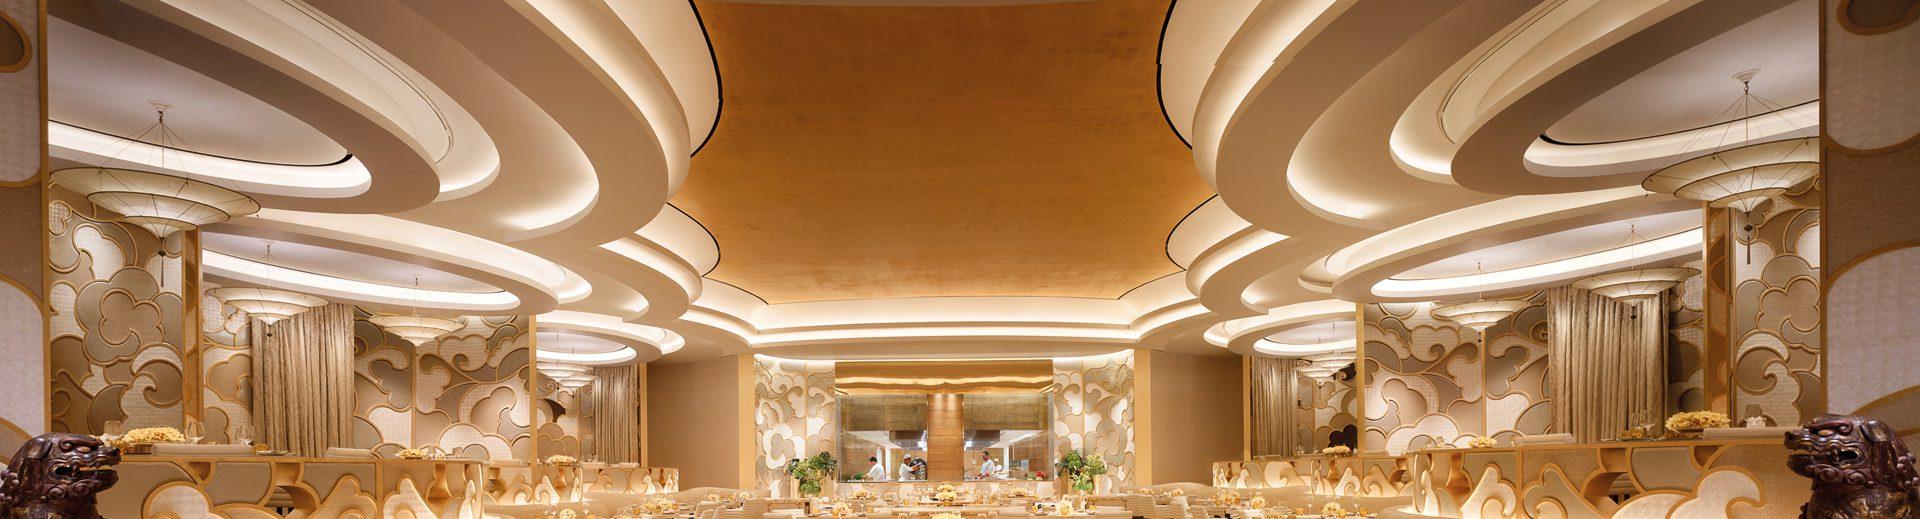 27_Wynn Palace_Andreas_Main Dining_ Barbara Kraft_Banner